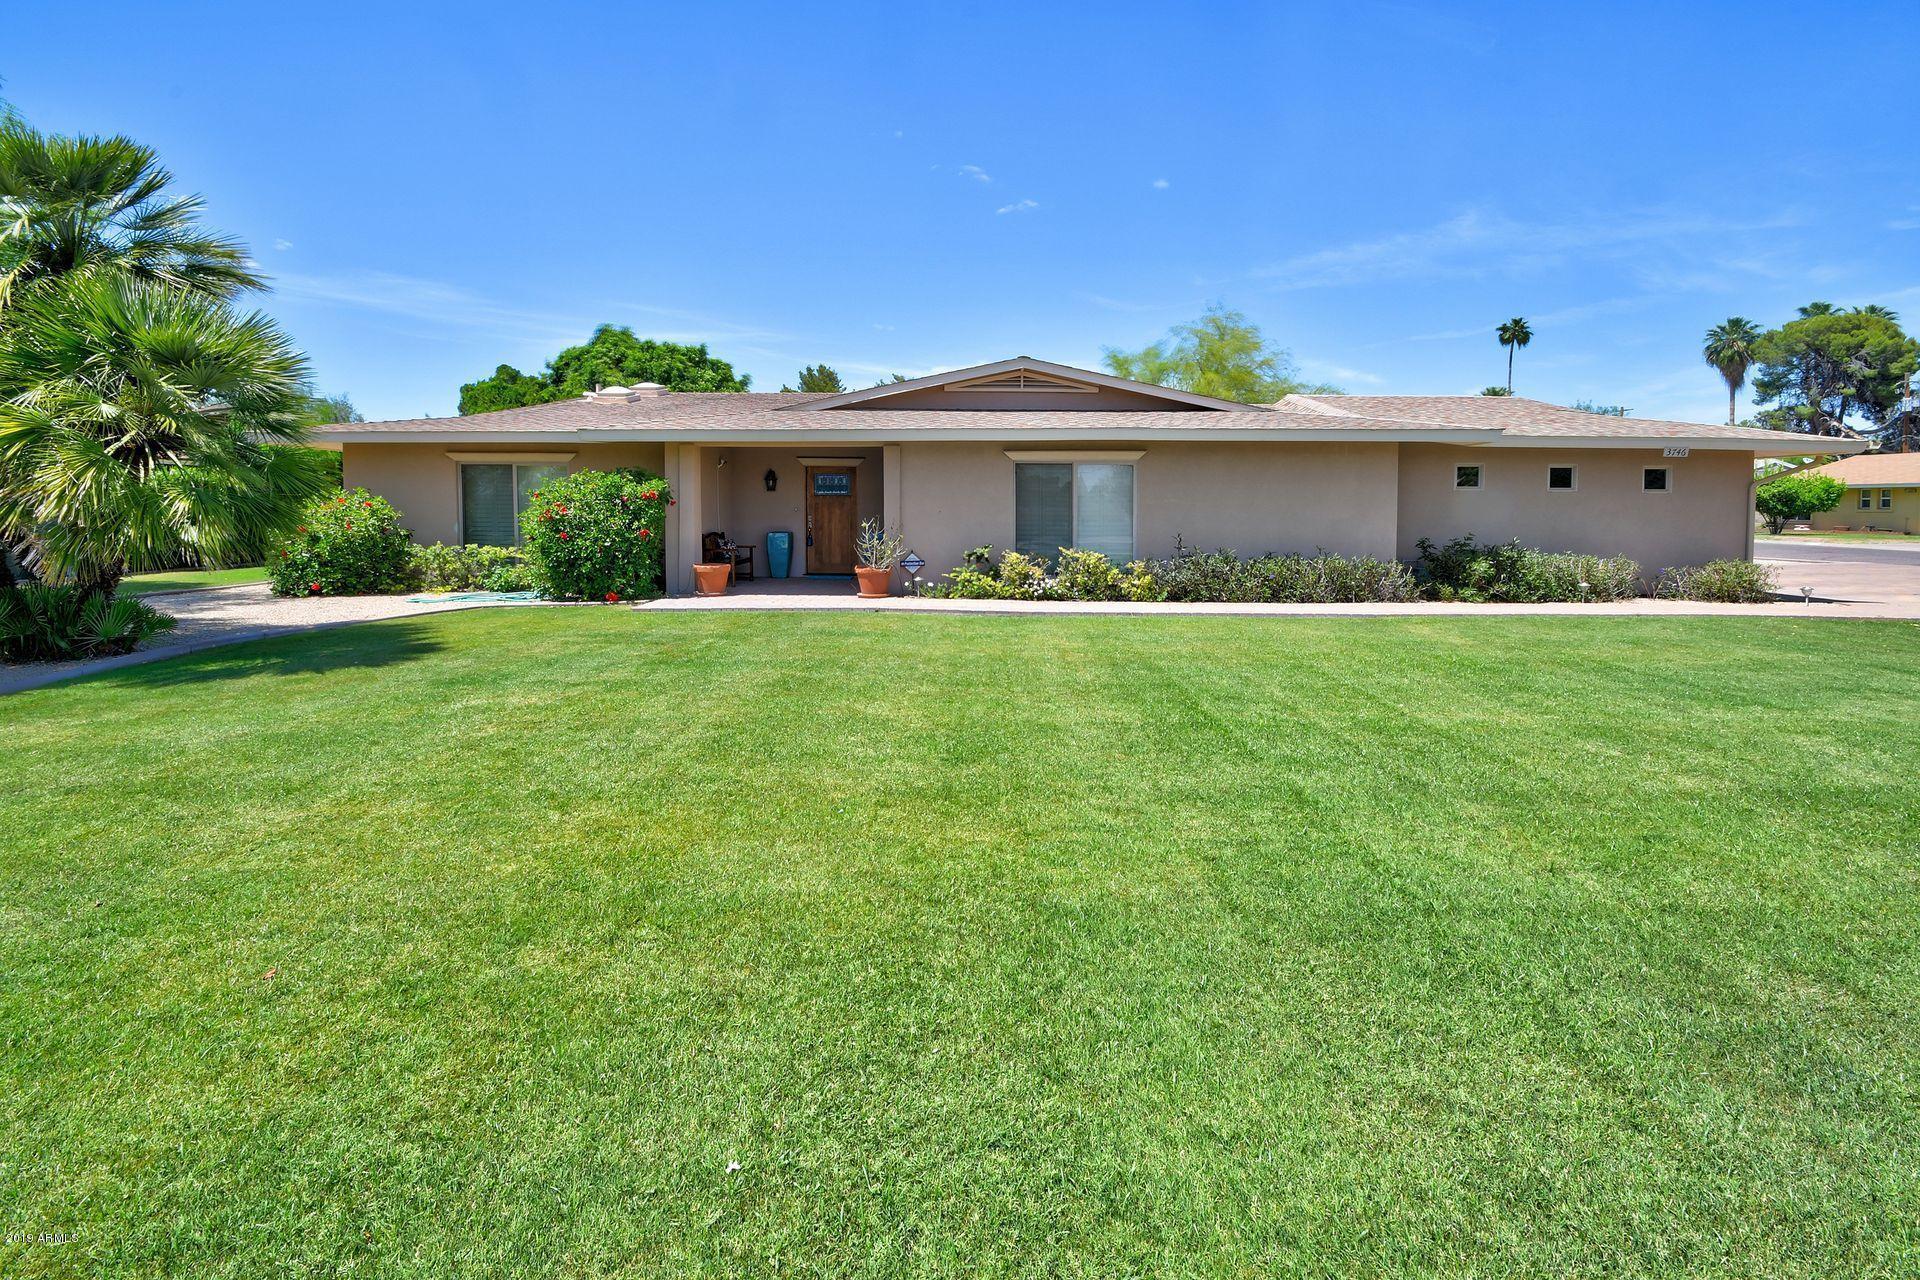 3746 E CAMPBELL Avenue, Phoenix-Camelback Corridor, Arizona